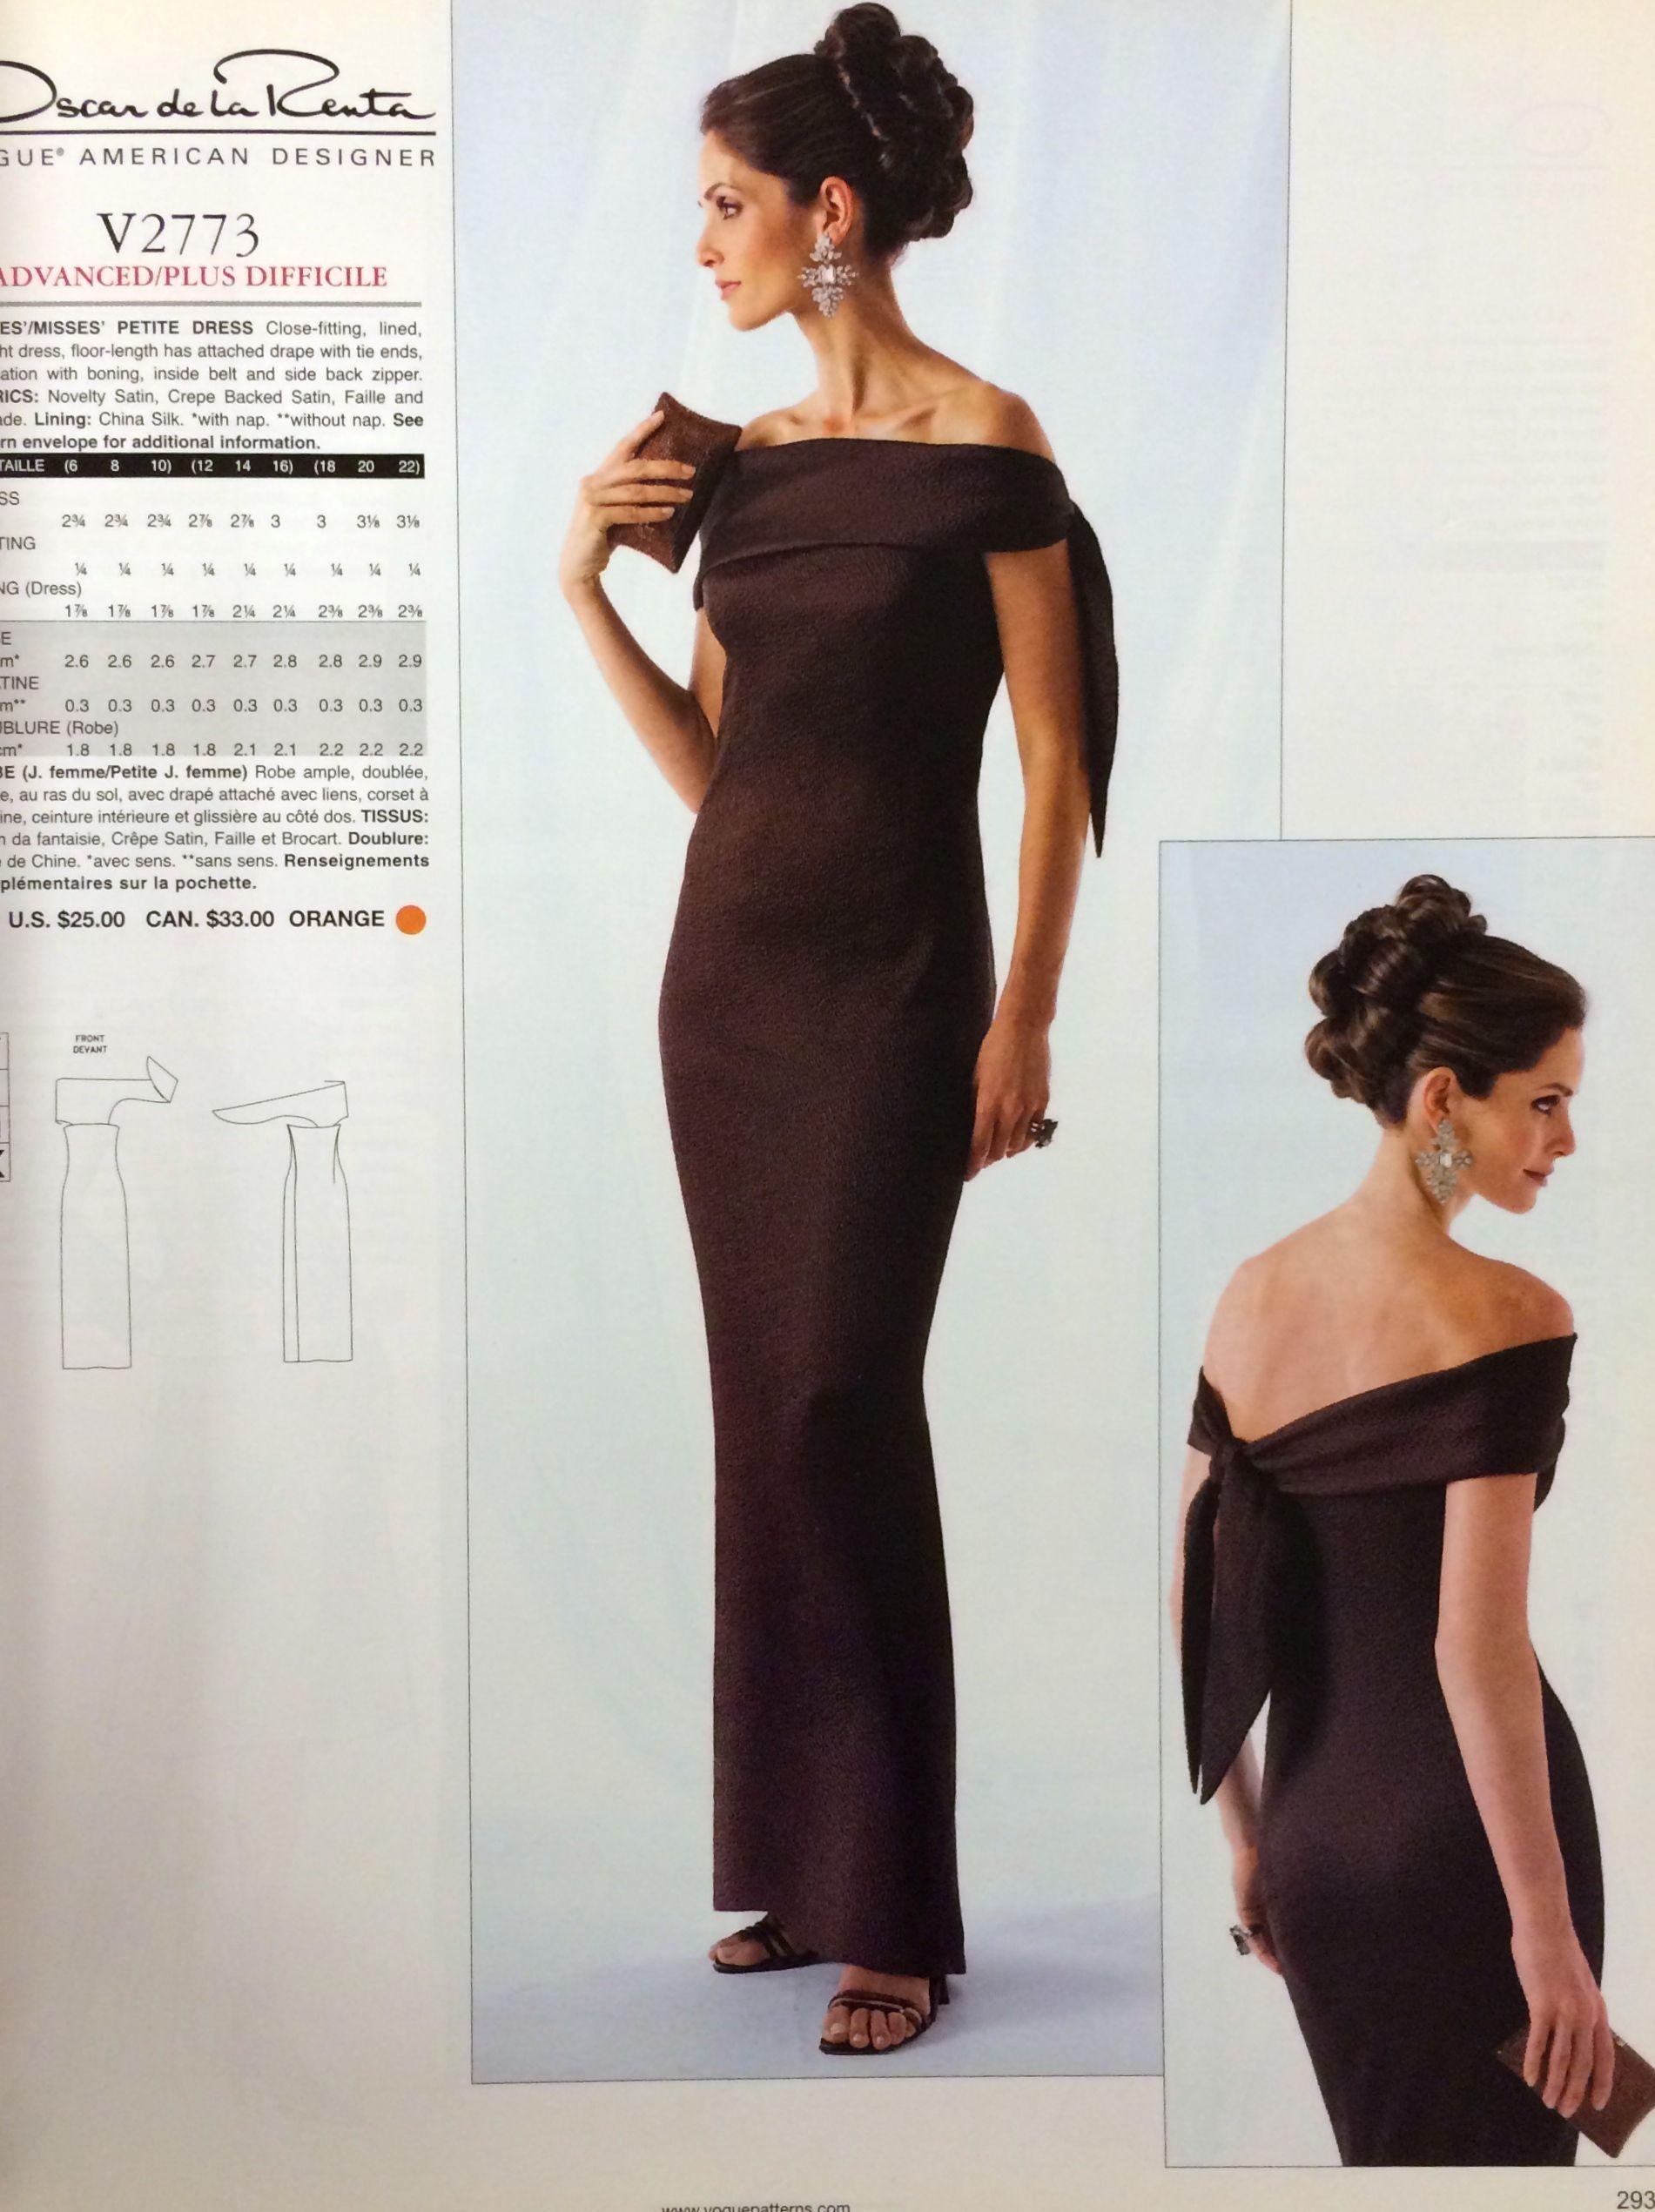 Oscar de la Renta sewing pattern for Vogue Patterns, c. 1990s-2000s ...